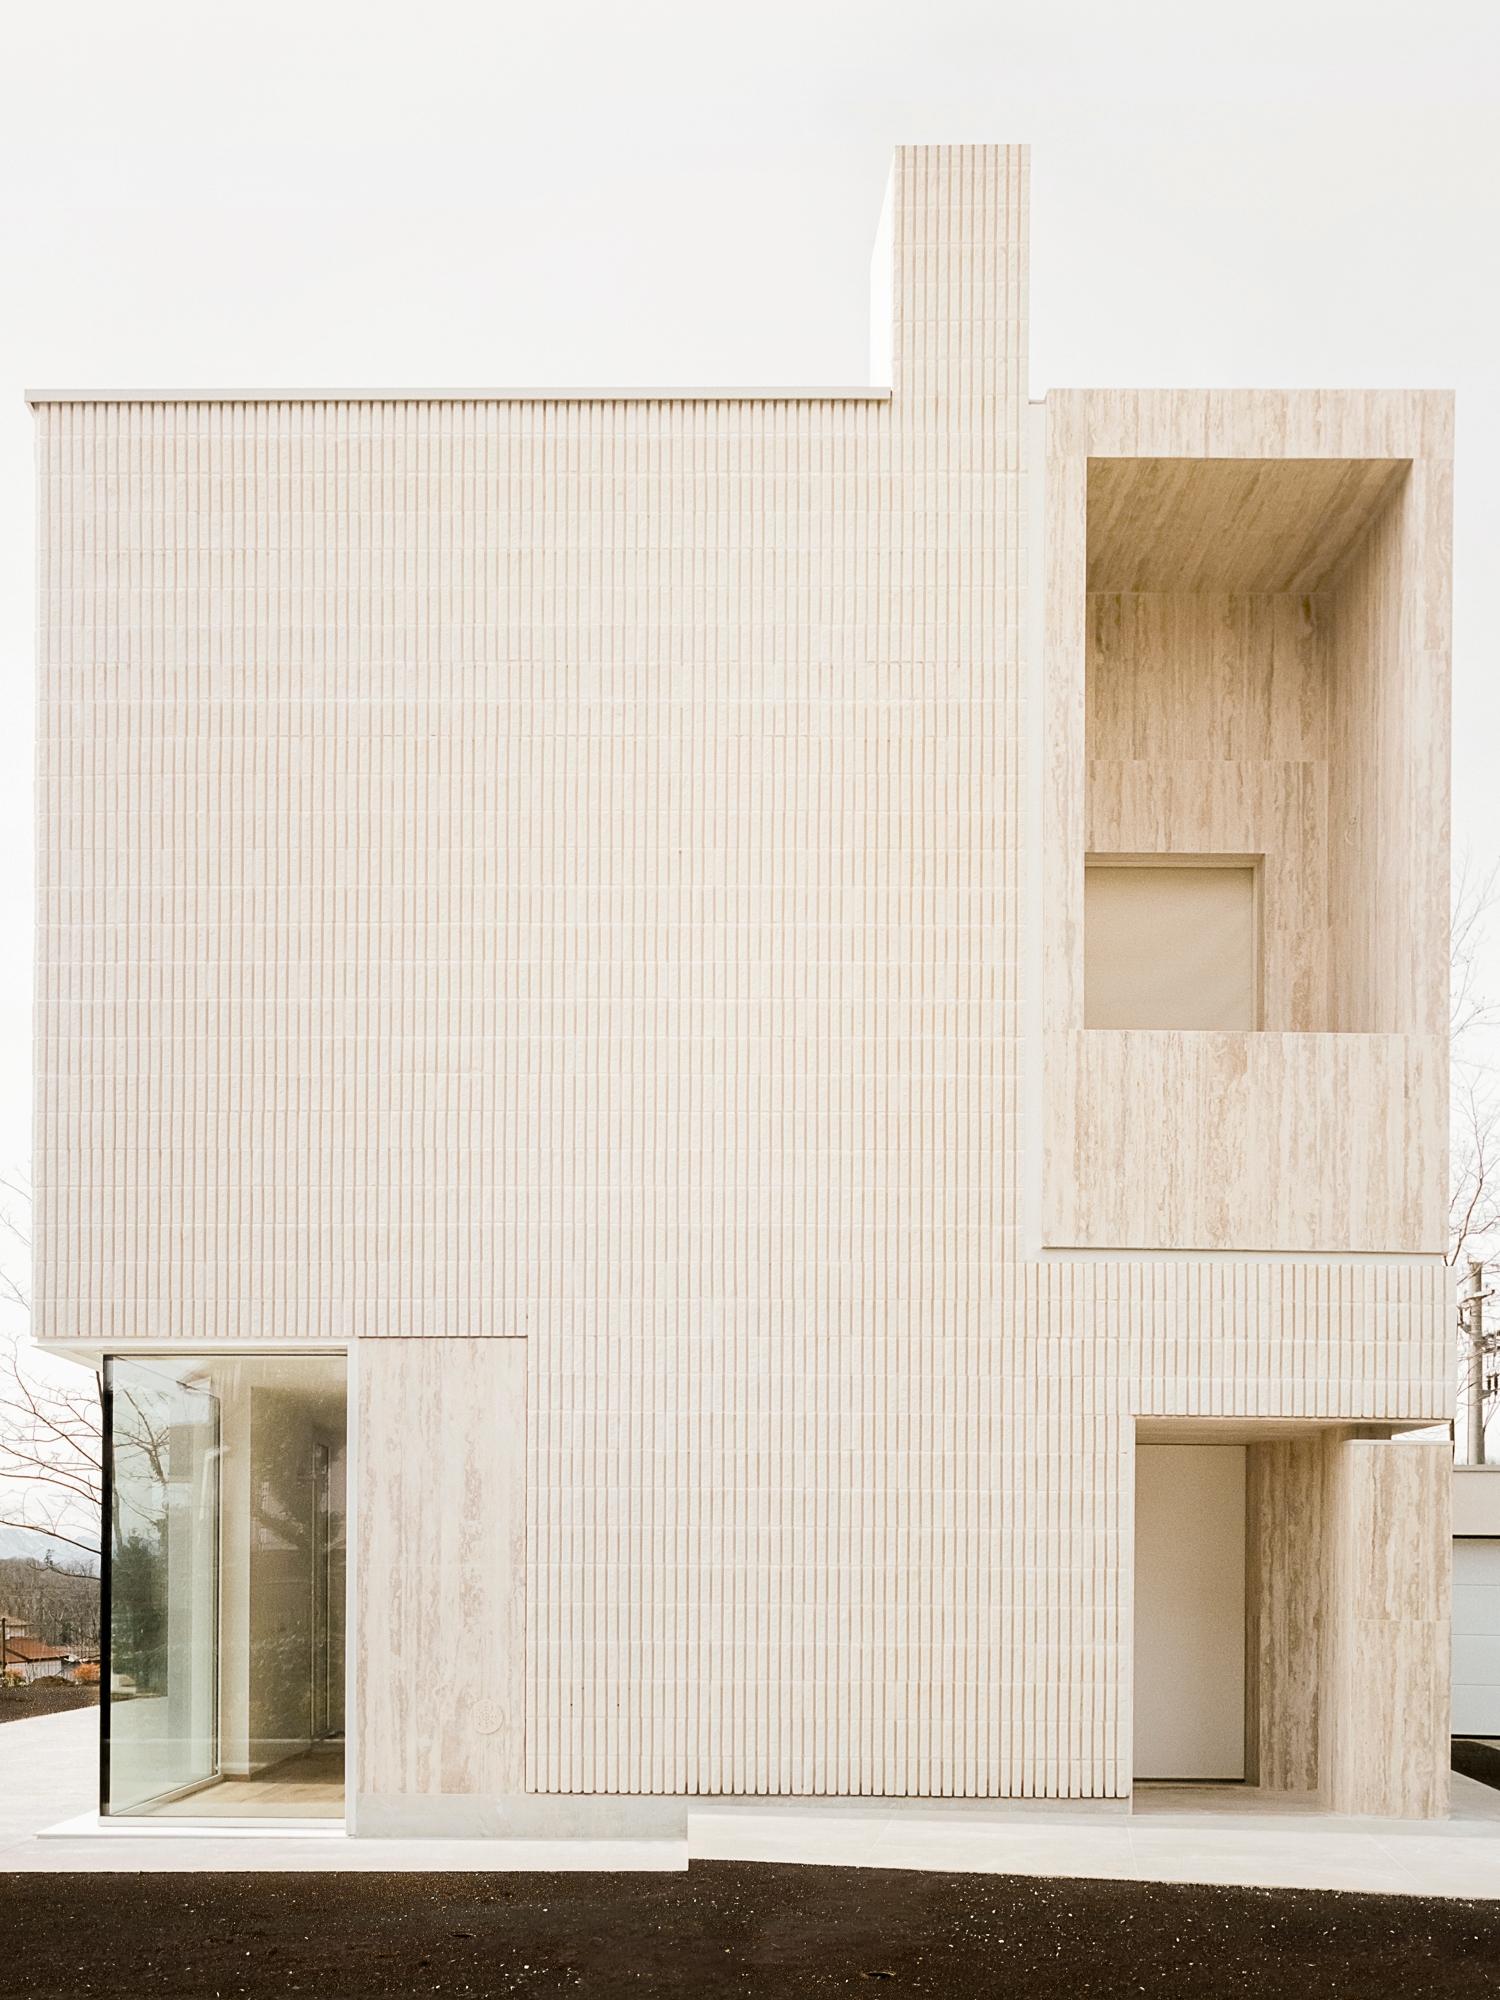 House Archeologist LCA Architet - thetreemag | ello